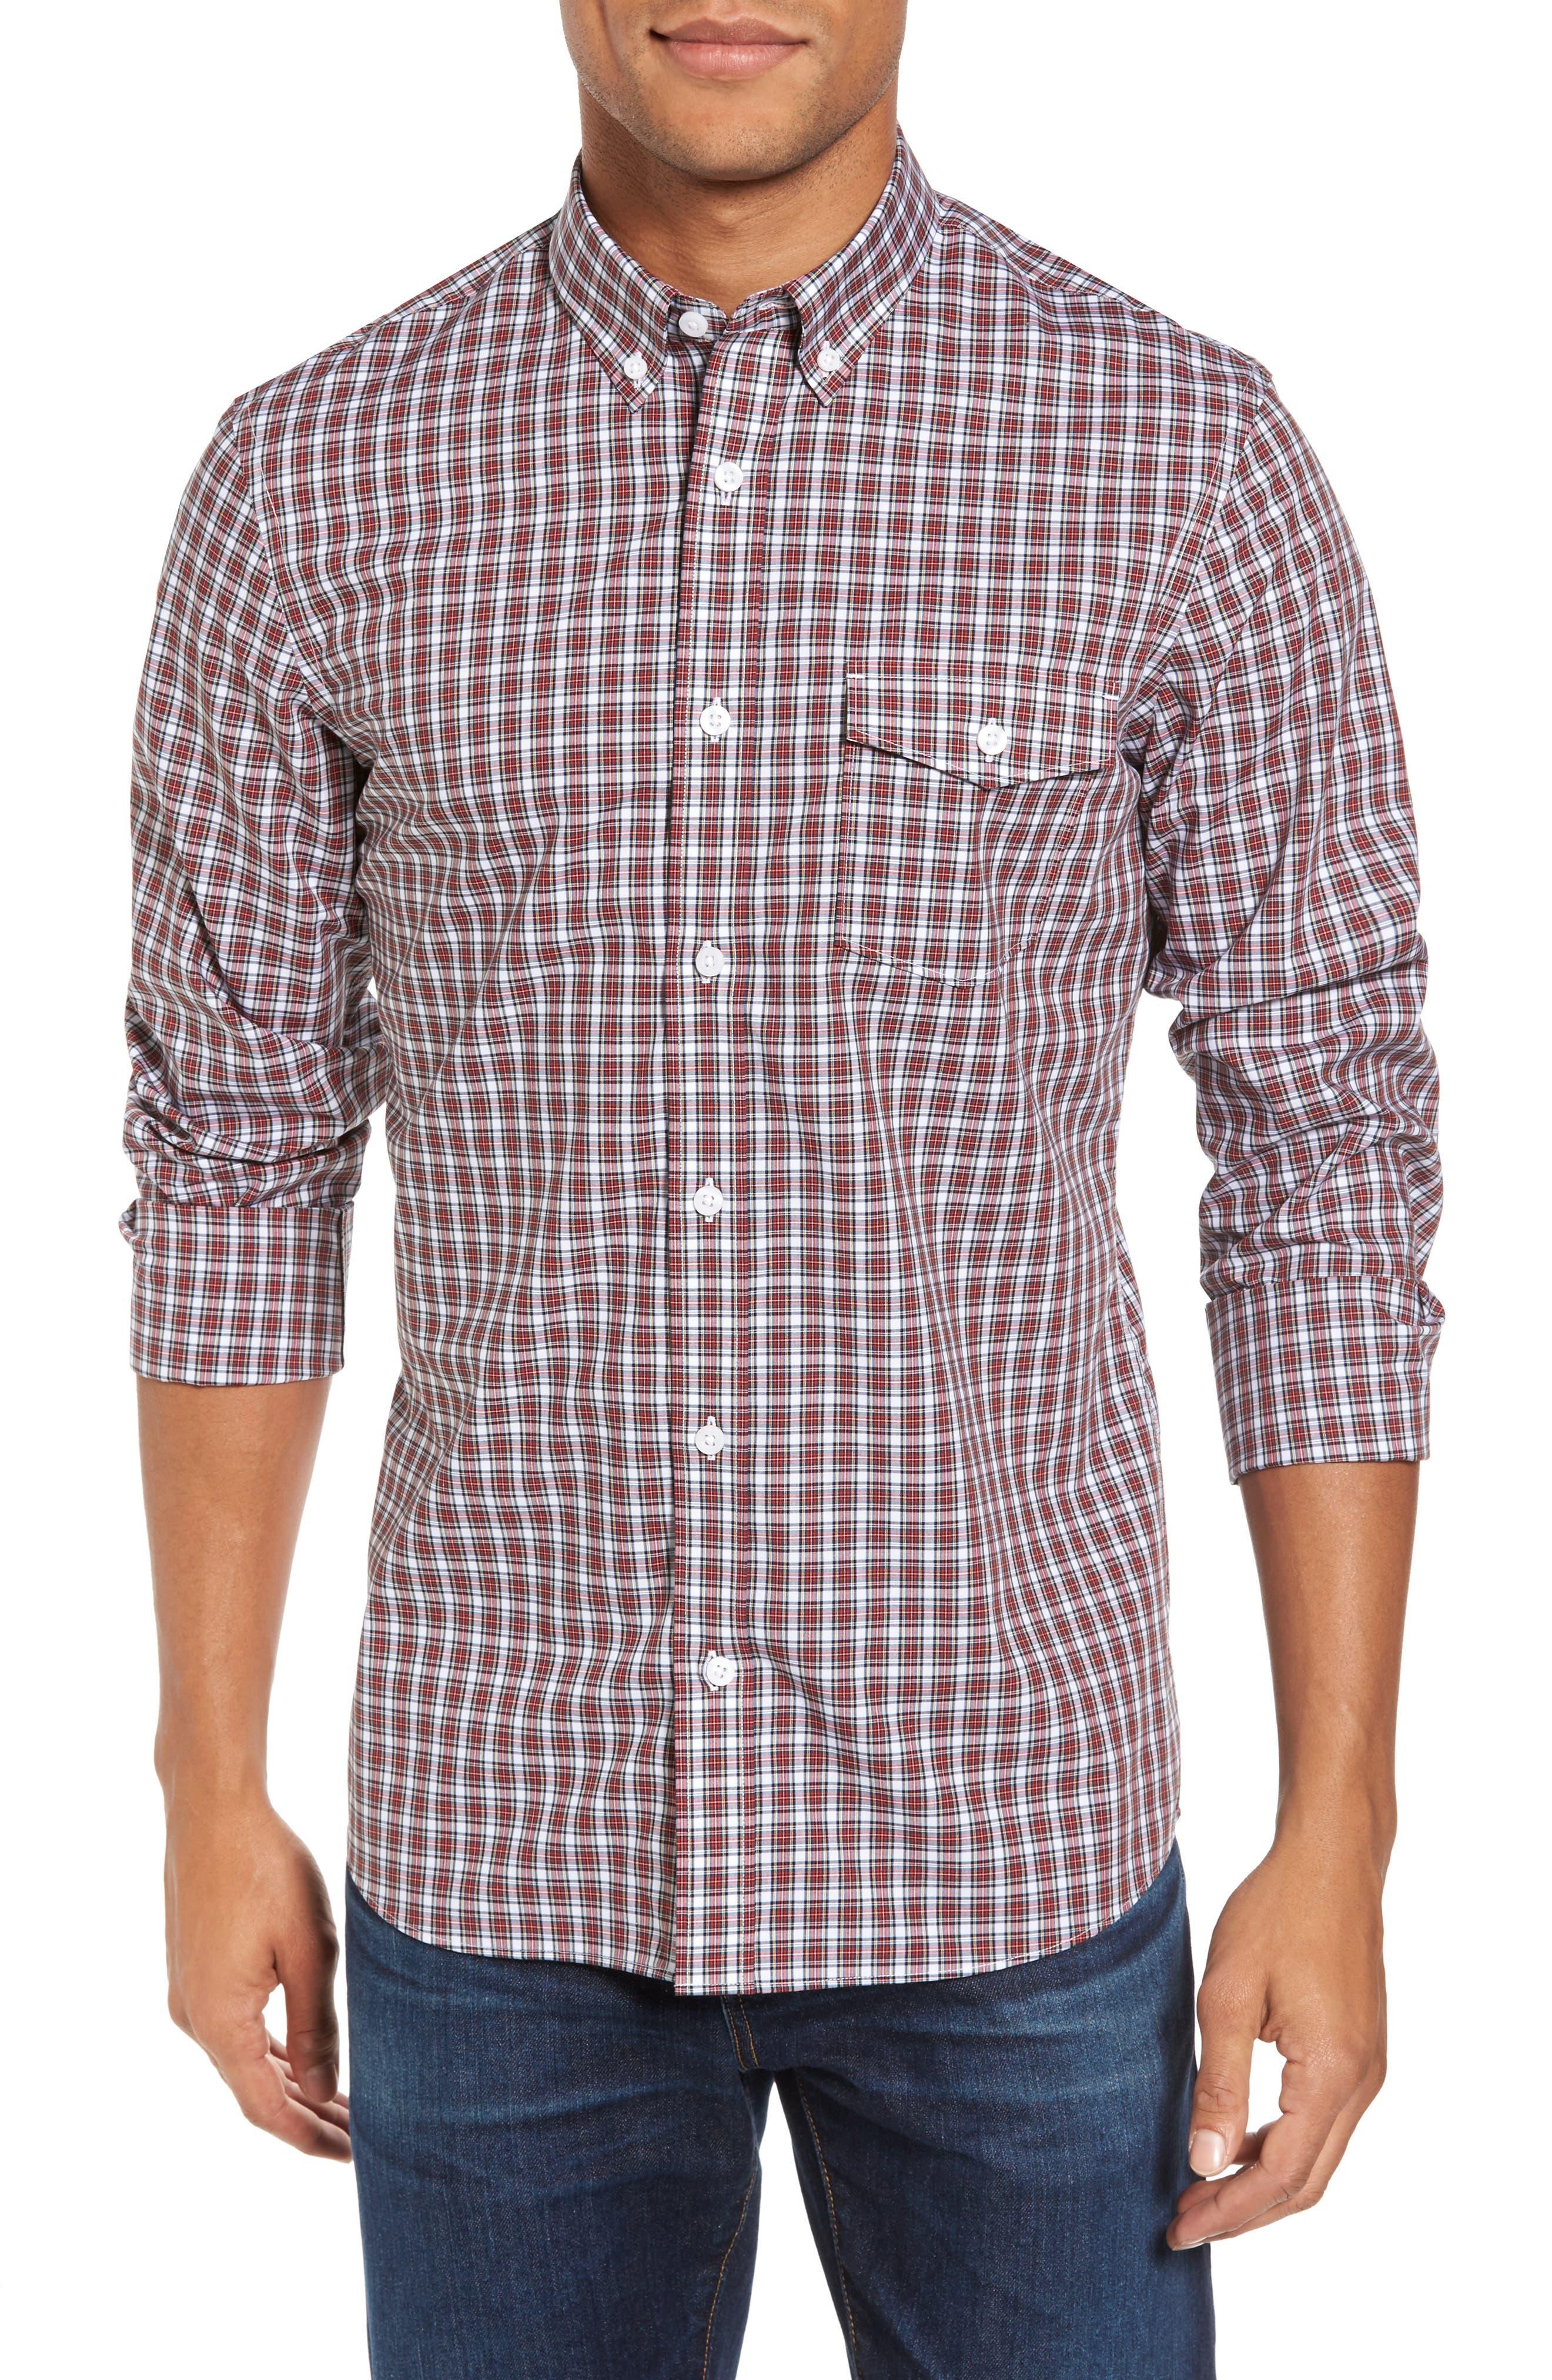 Main Image - Nordstrom Men's Shop Ivy Trim Fit Non-Iron Tartan Plaid Sport Shirt